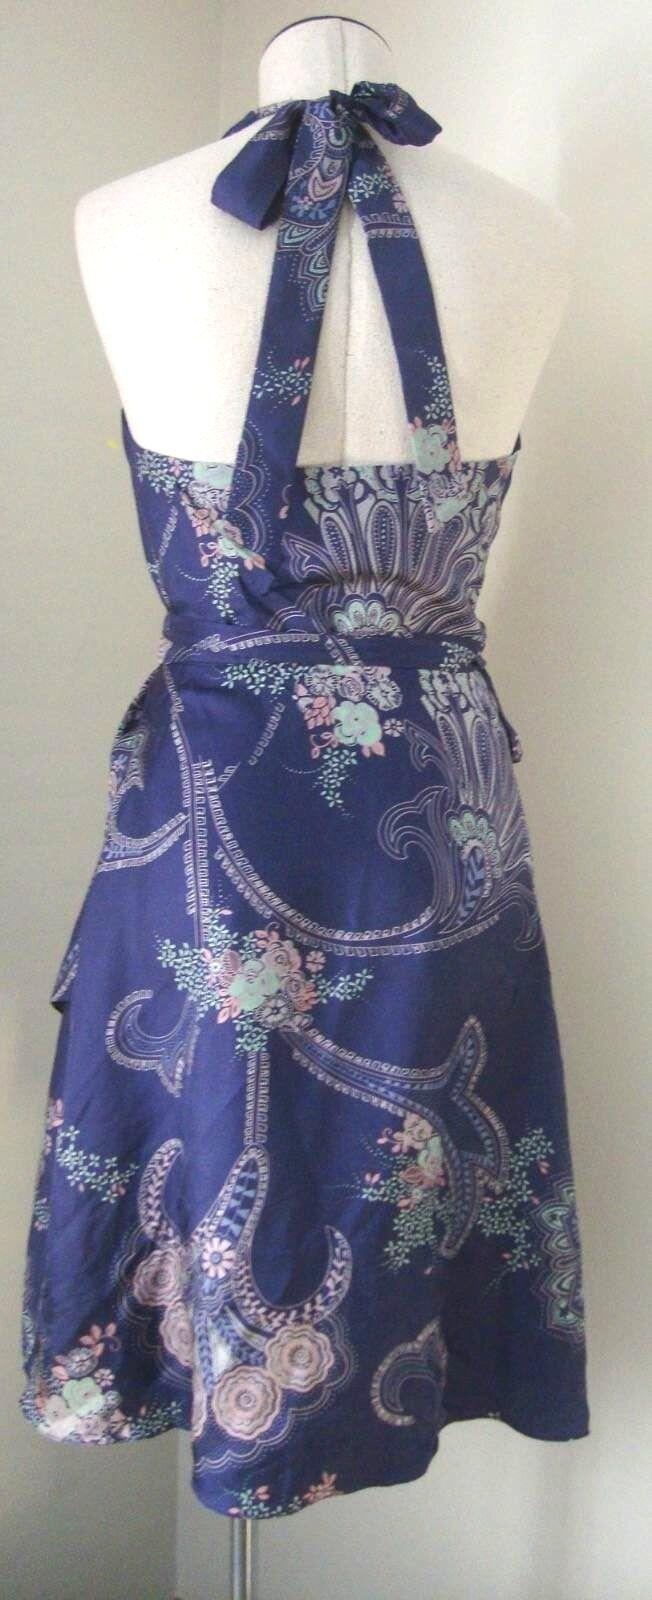 TIBI DEEP lila AUBERGINE PAISLEY FLORAL 100% SILK WRAP HALTER STYLE SUN DRESS